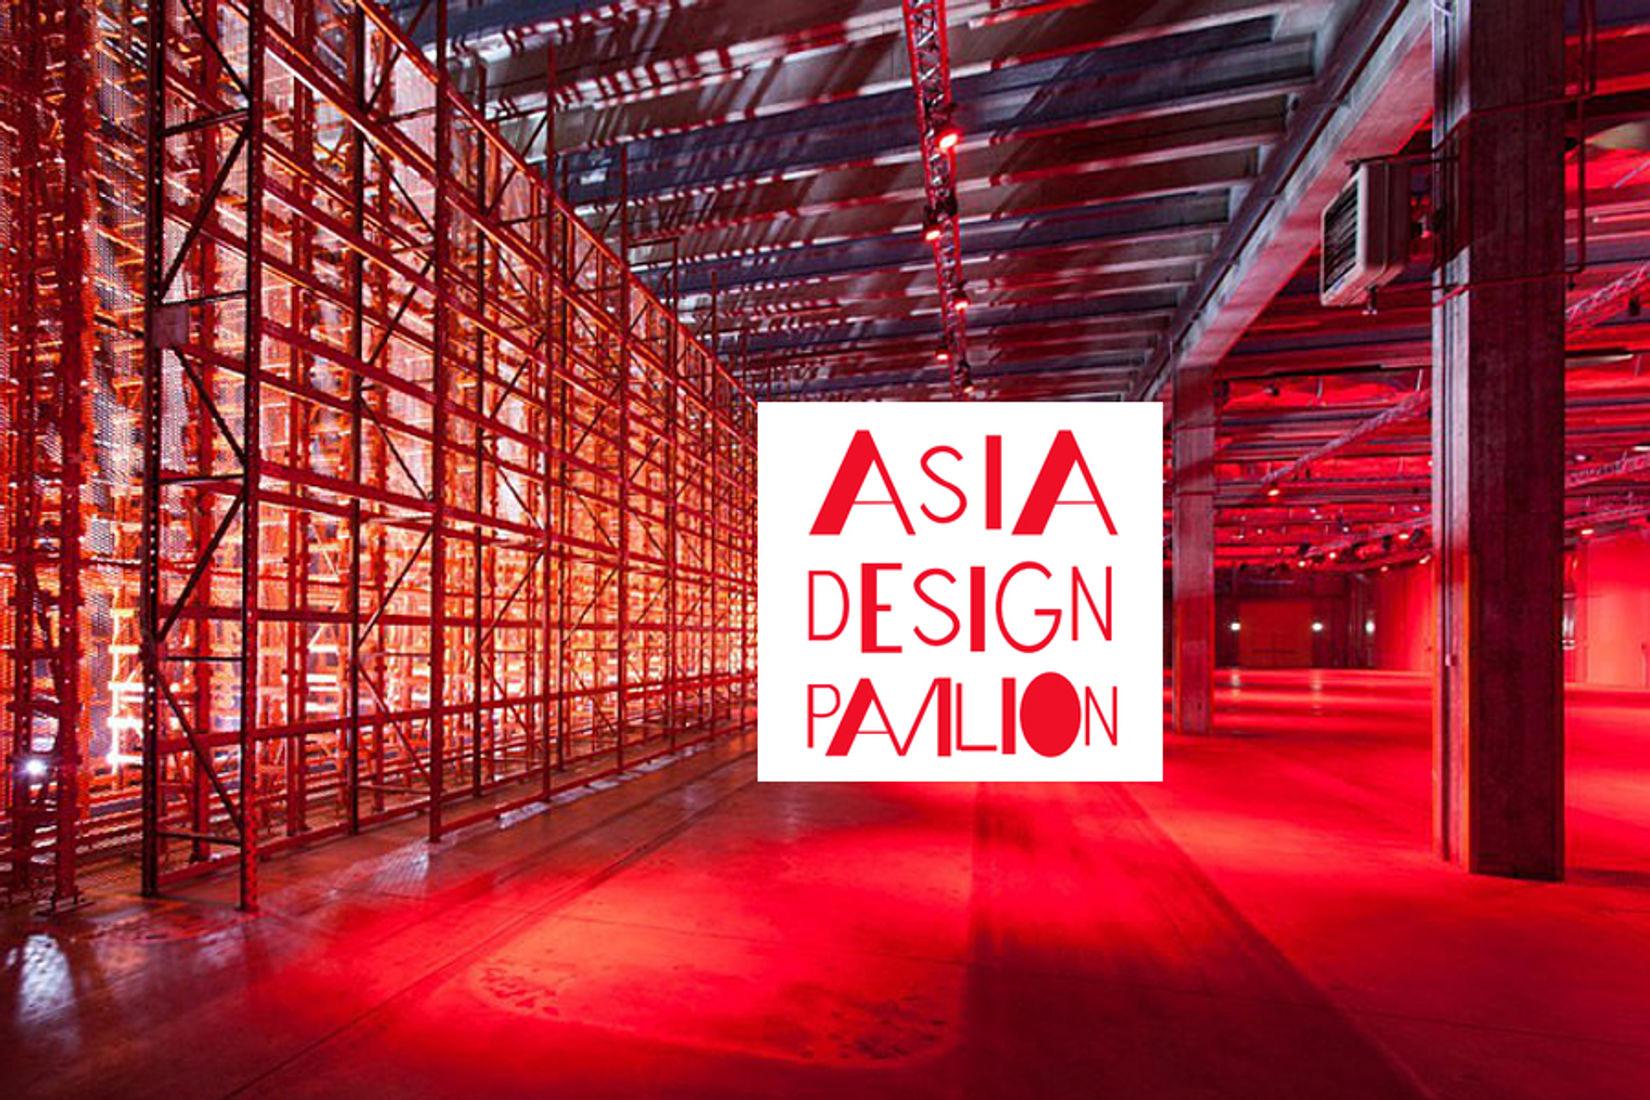 Milan Salone Preview: Asia Design Pavilion